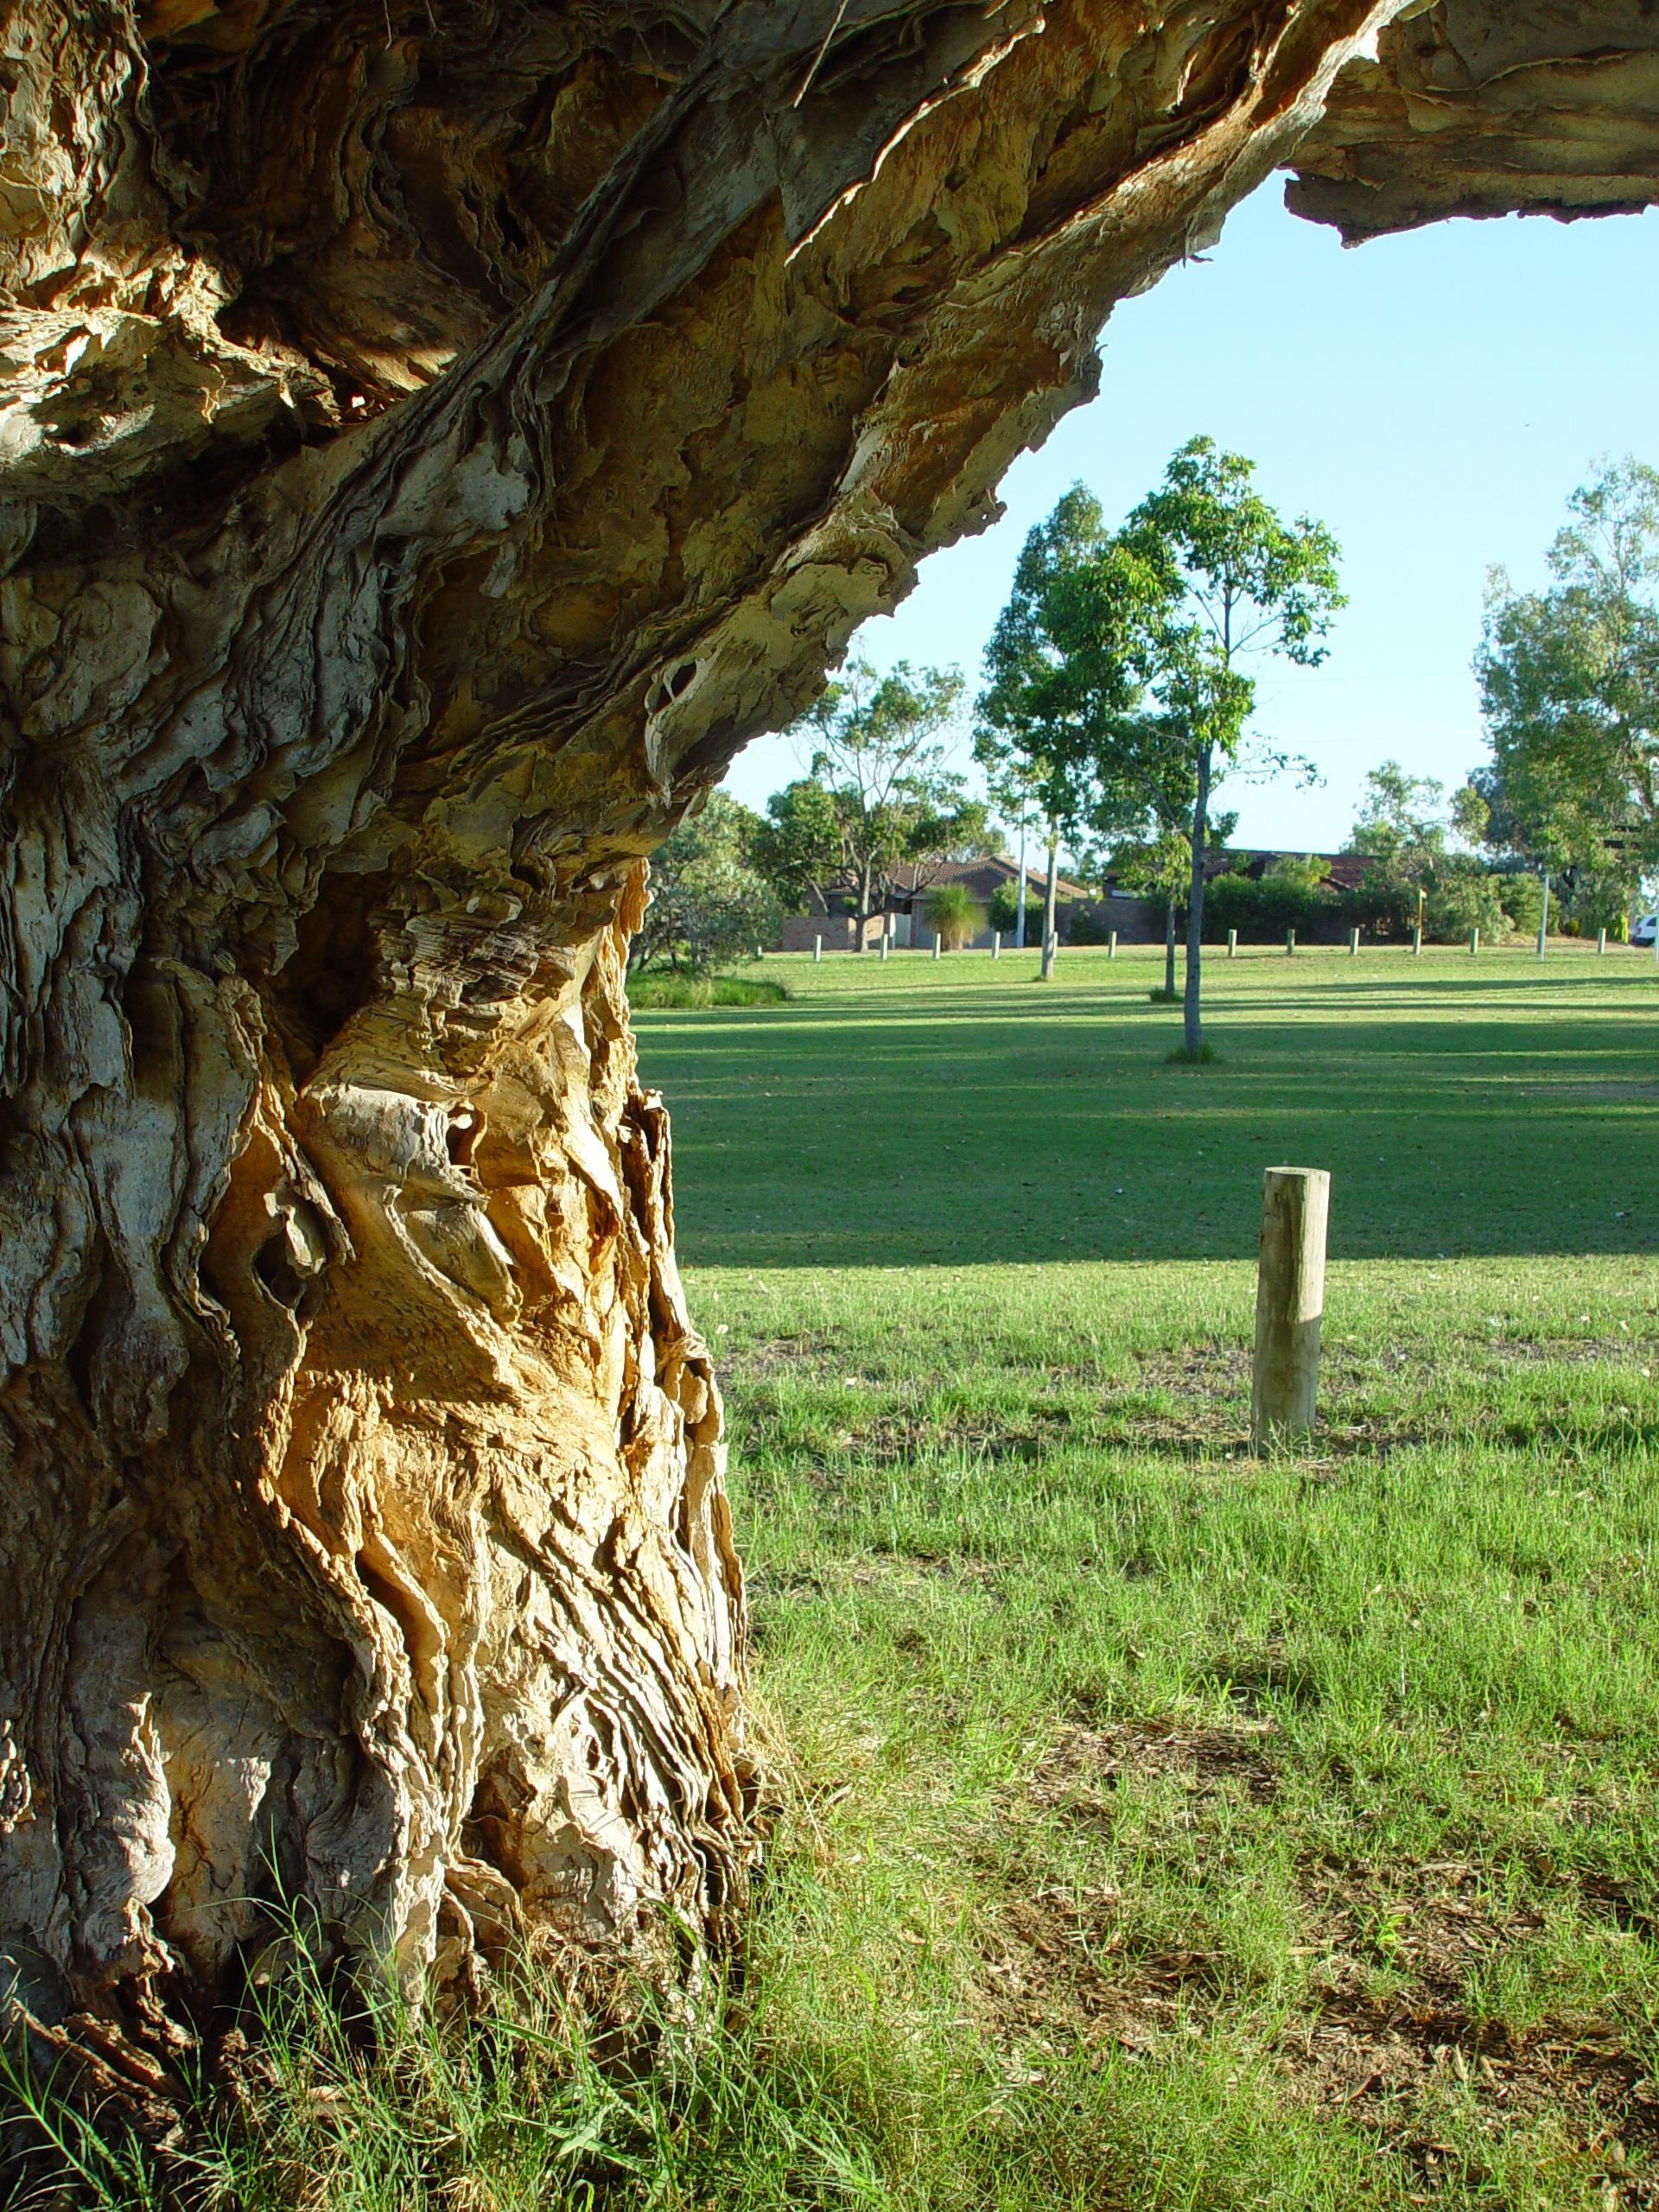 description of trees for essays